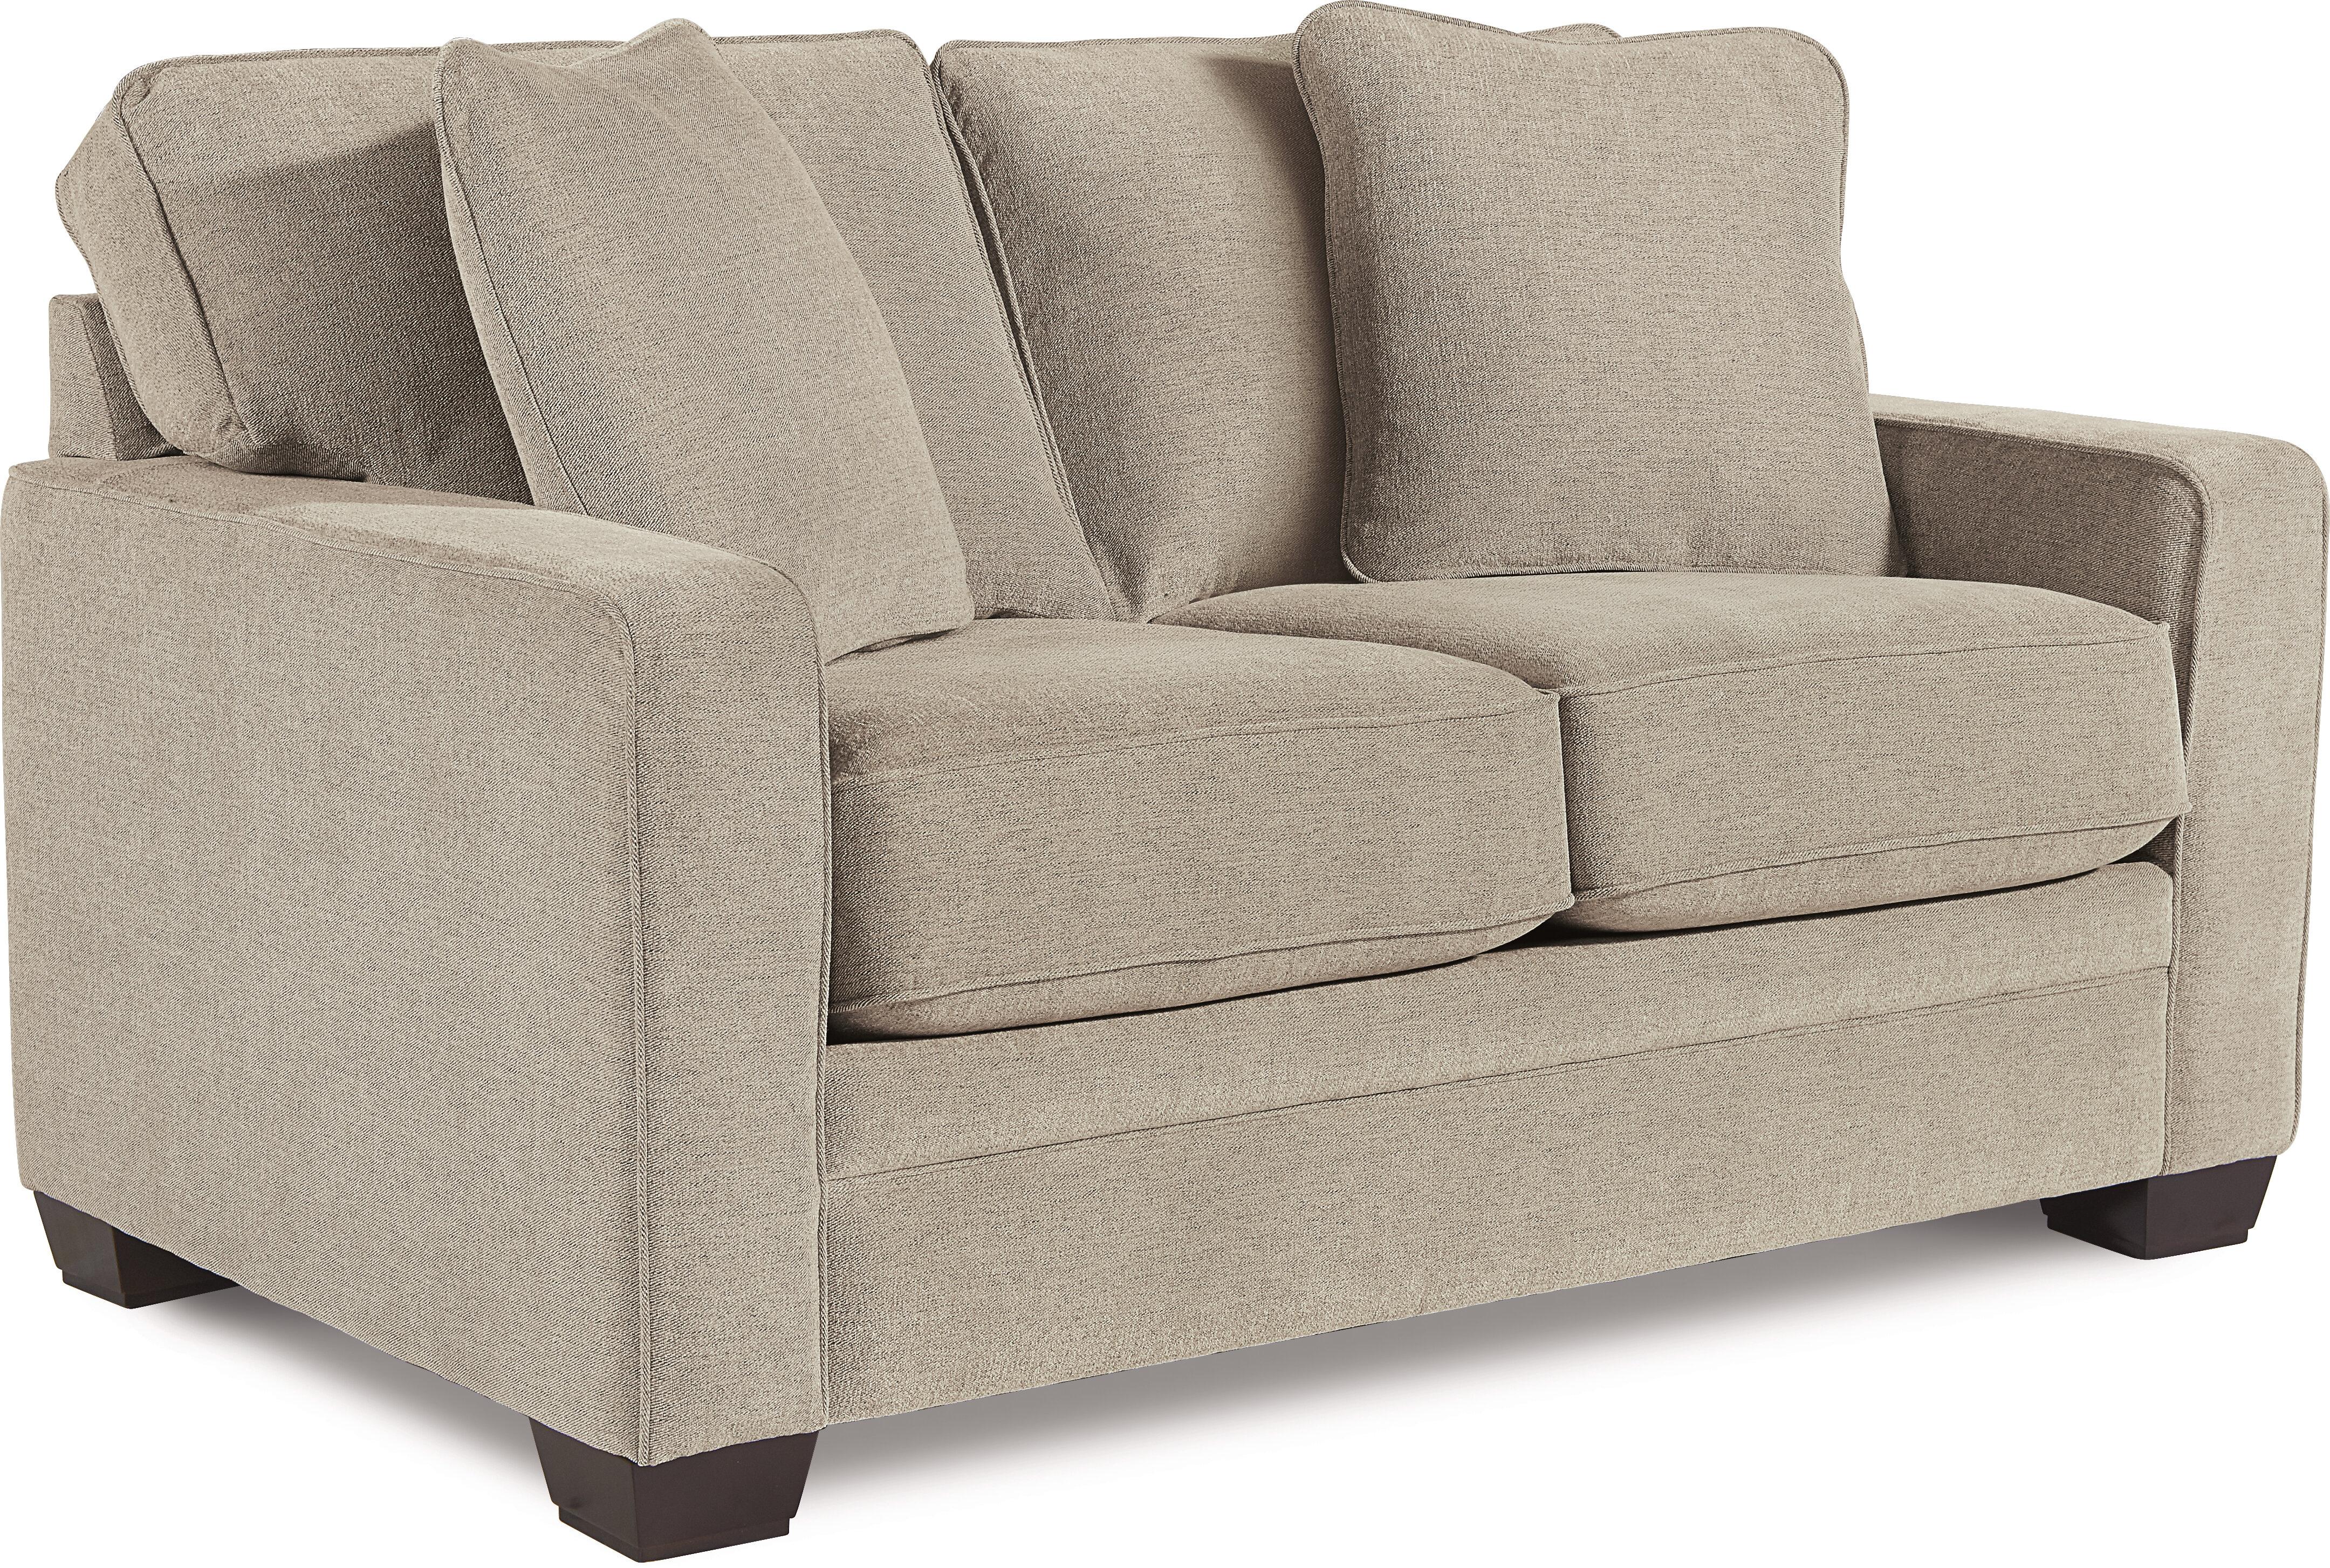 Incredible Meyer Premier Loveseat Ibusinesslaw Wood Chair Design Ideas Ibusinesslaworg